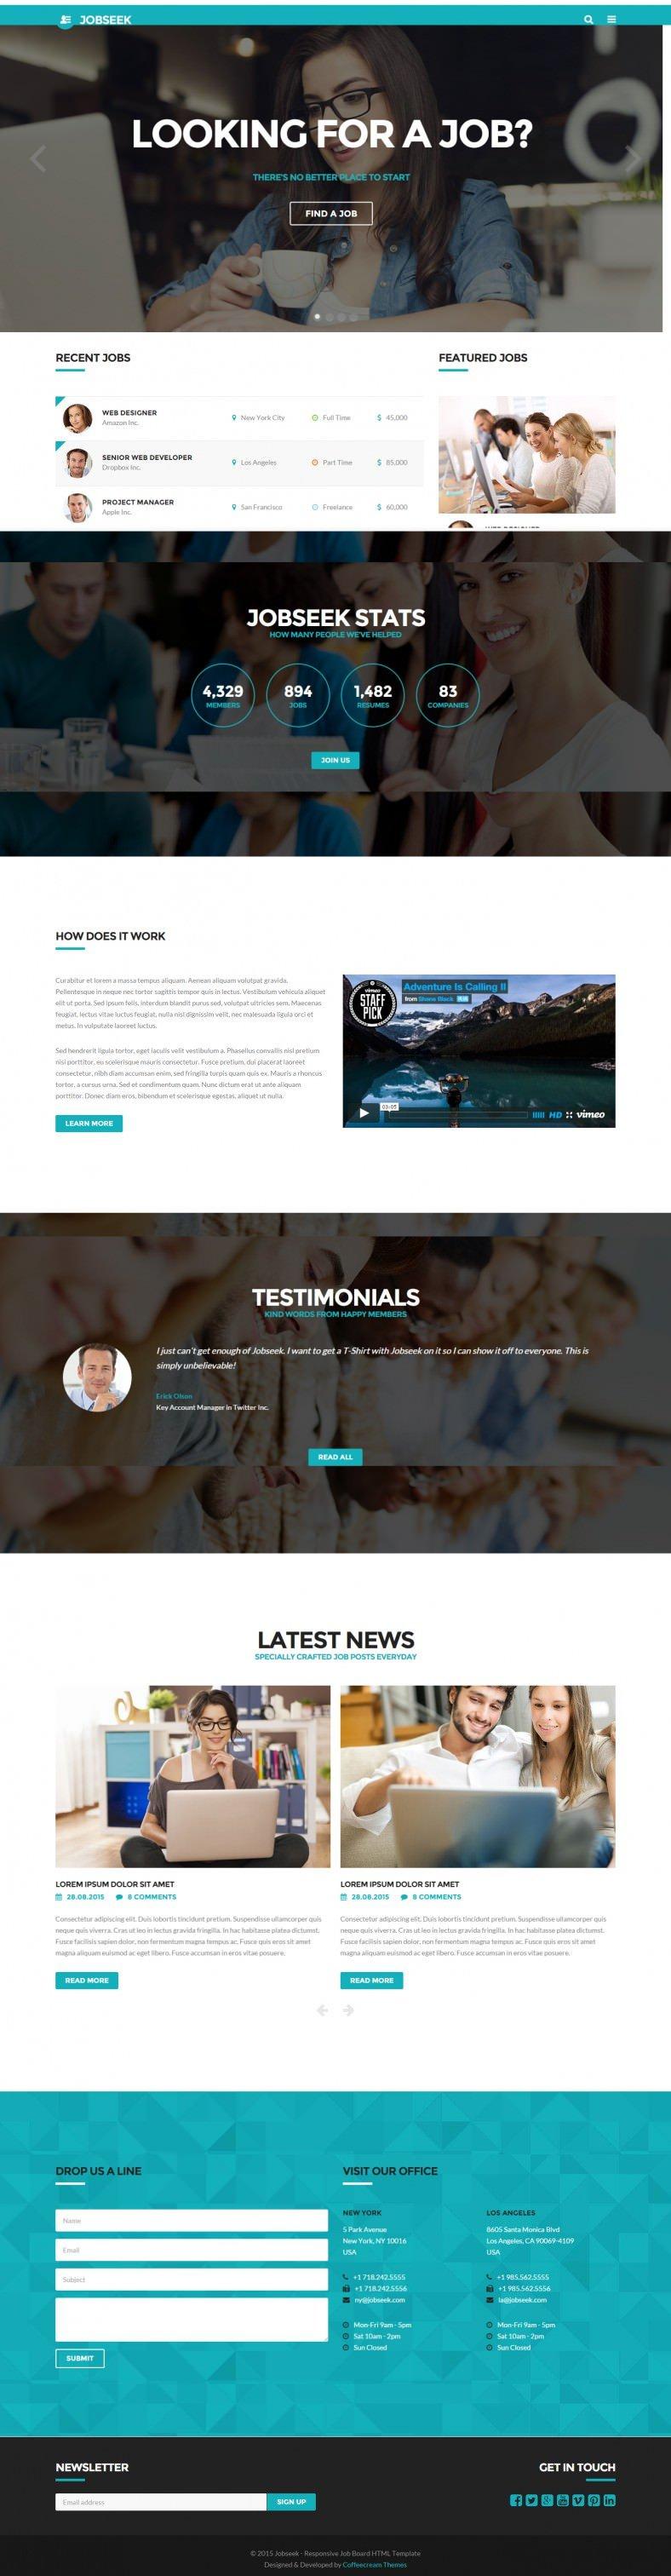 bootstrap 3 responsive job board html template 788x3024